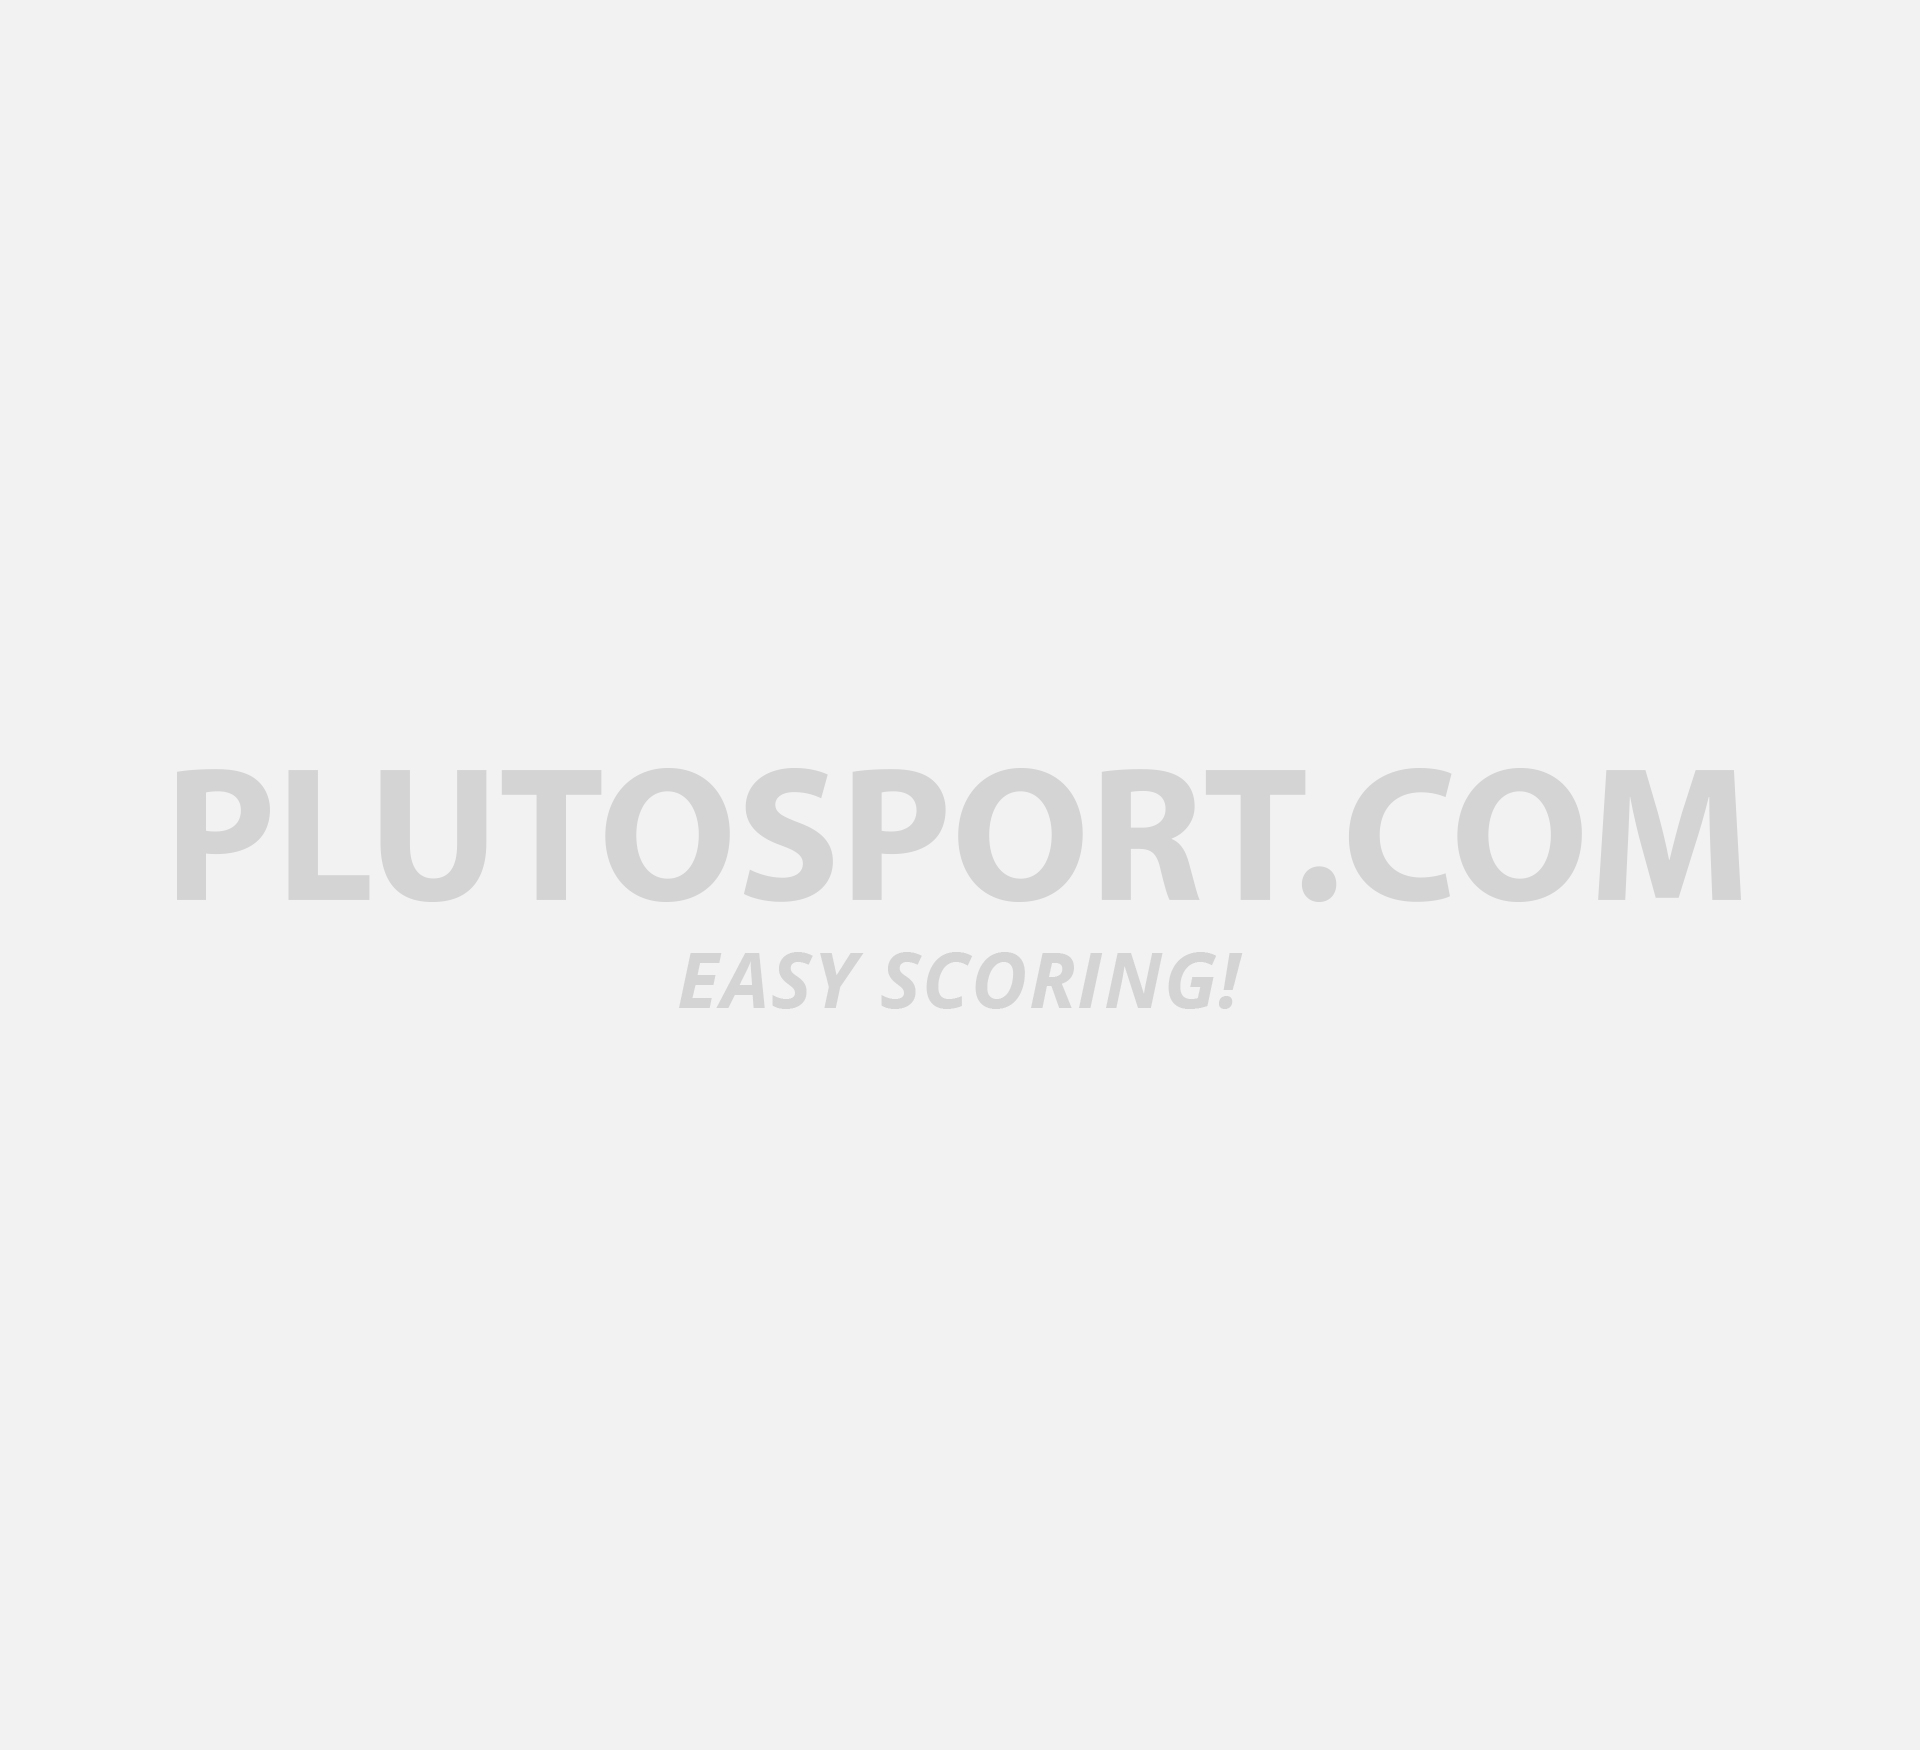 80a977f954d0 Adidas F50 AdiZero TRX FG Footballshoe Mens - Boots fixed stud ...